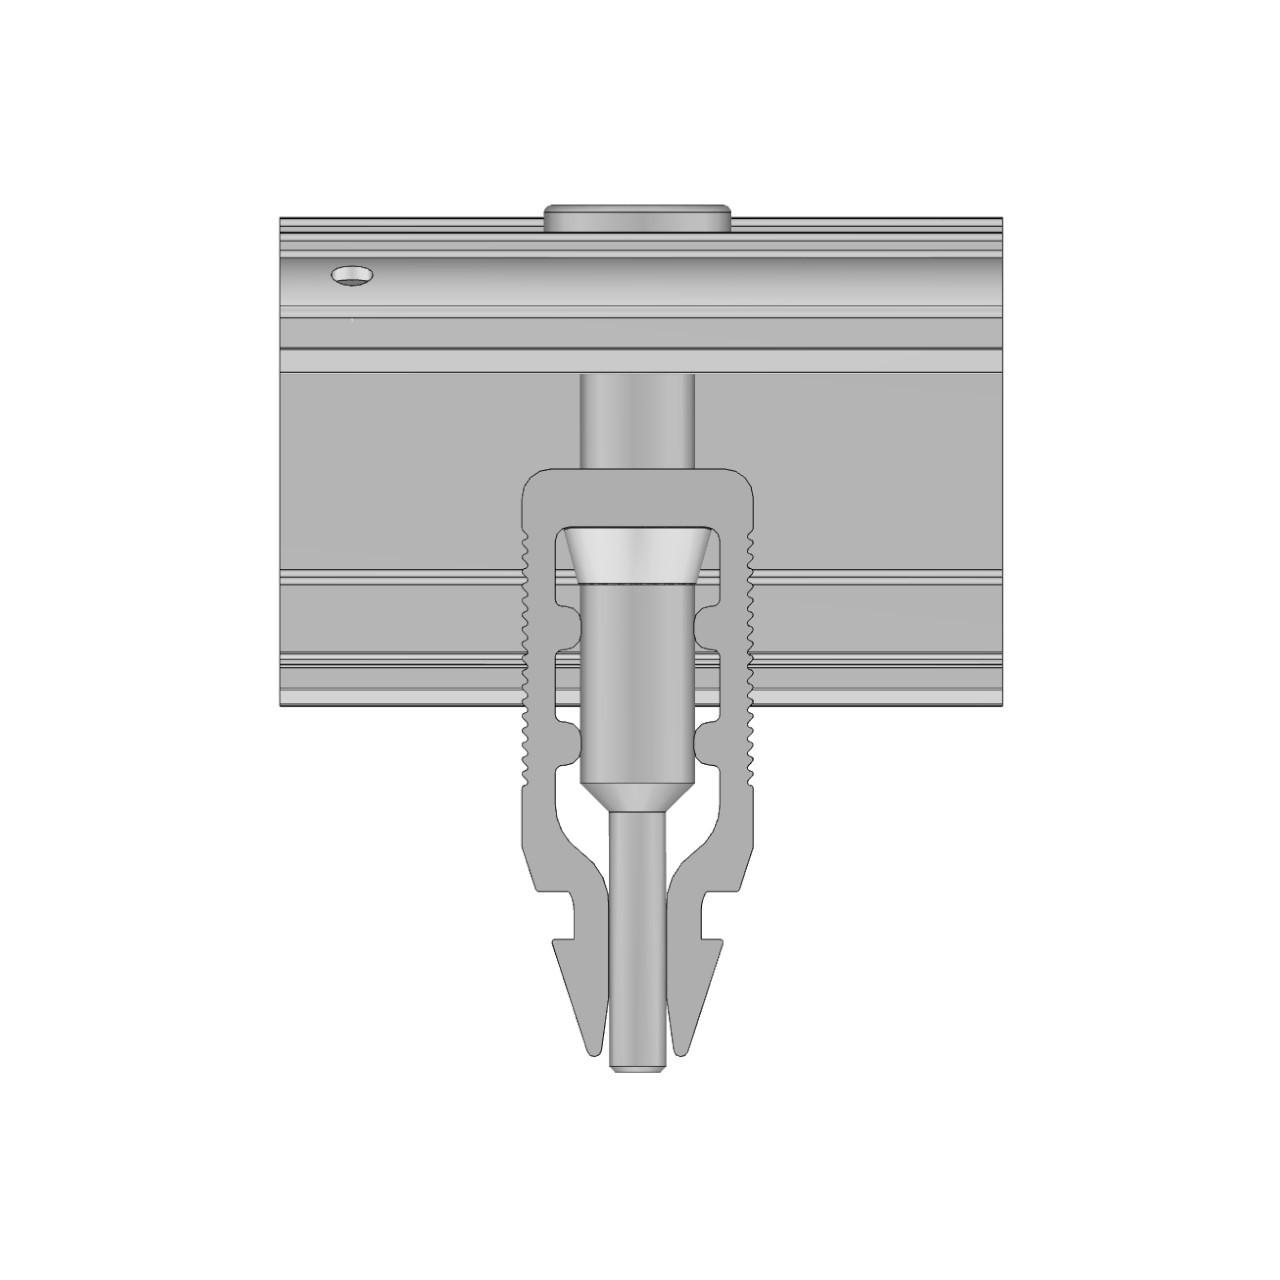 Schletter - Rapid16 End Clamp - Side